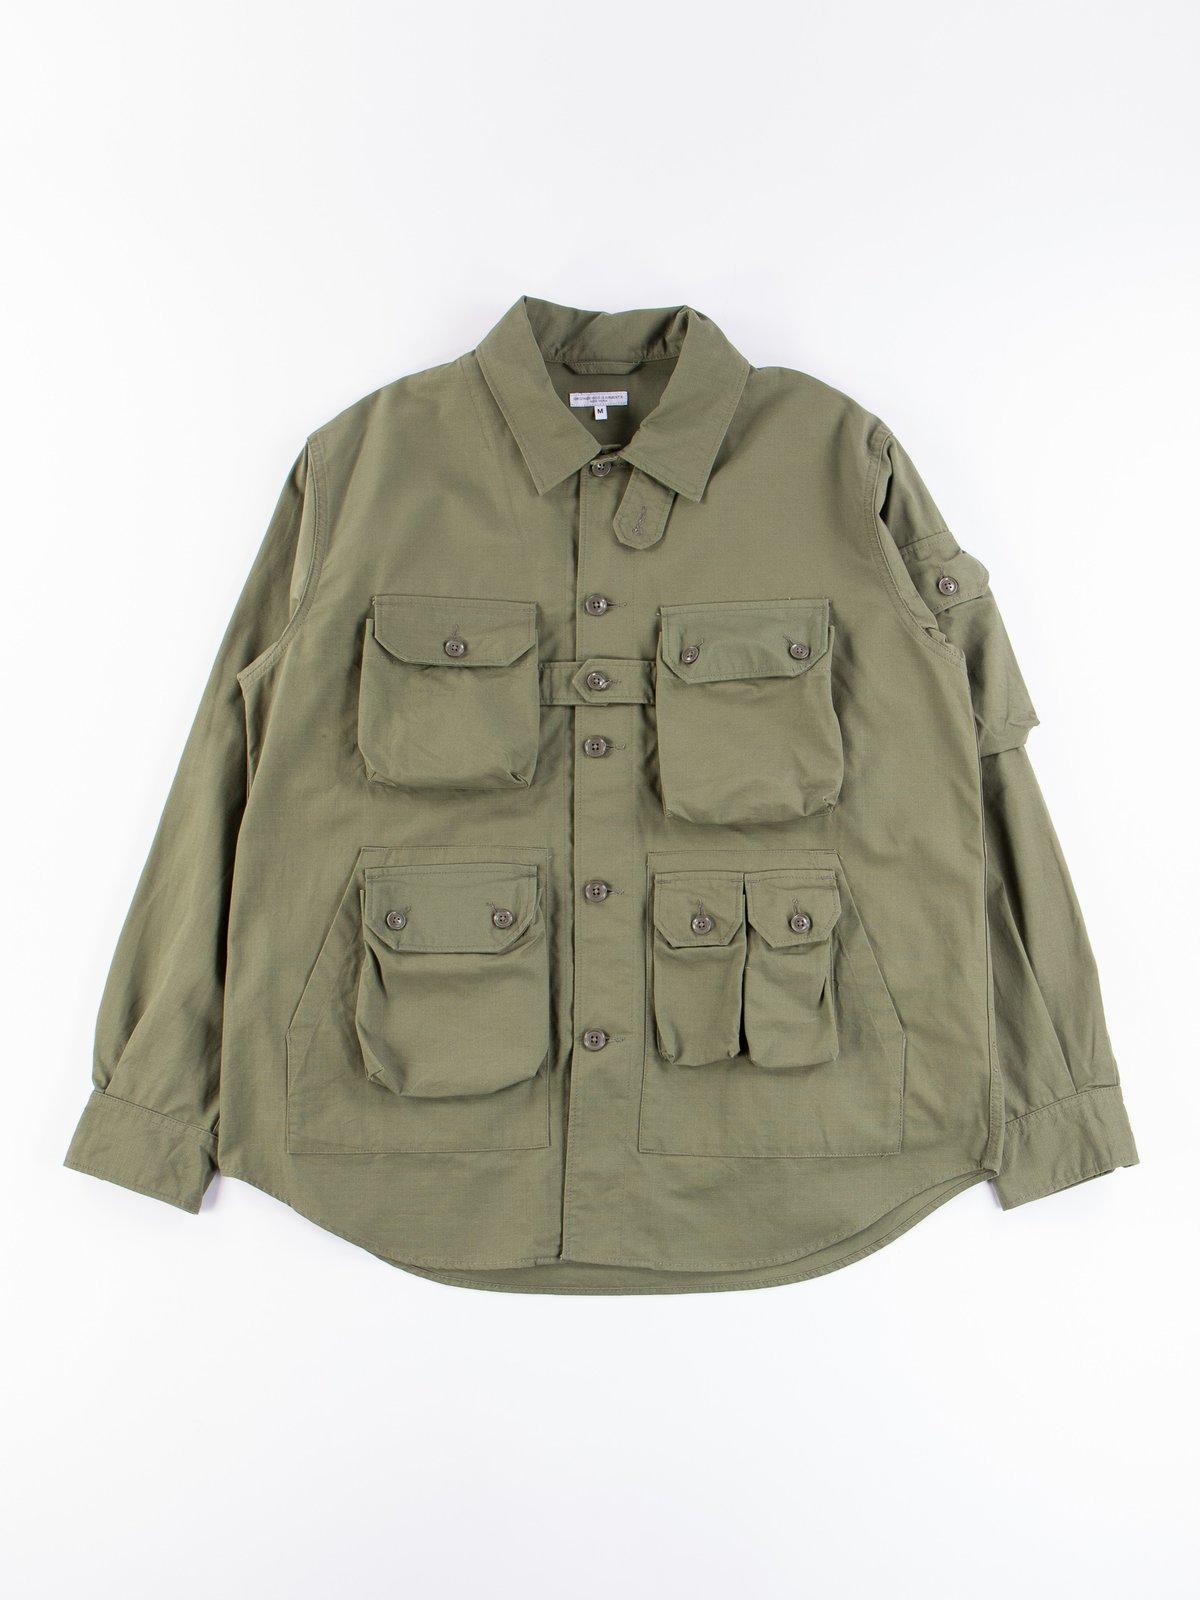 Olive Cotton Ripstop Explorer Shirt Jacket - Image 1